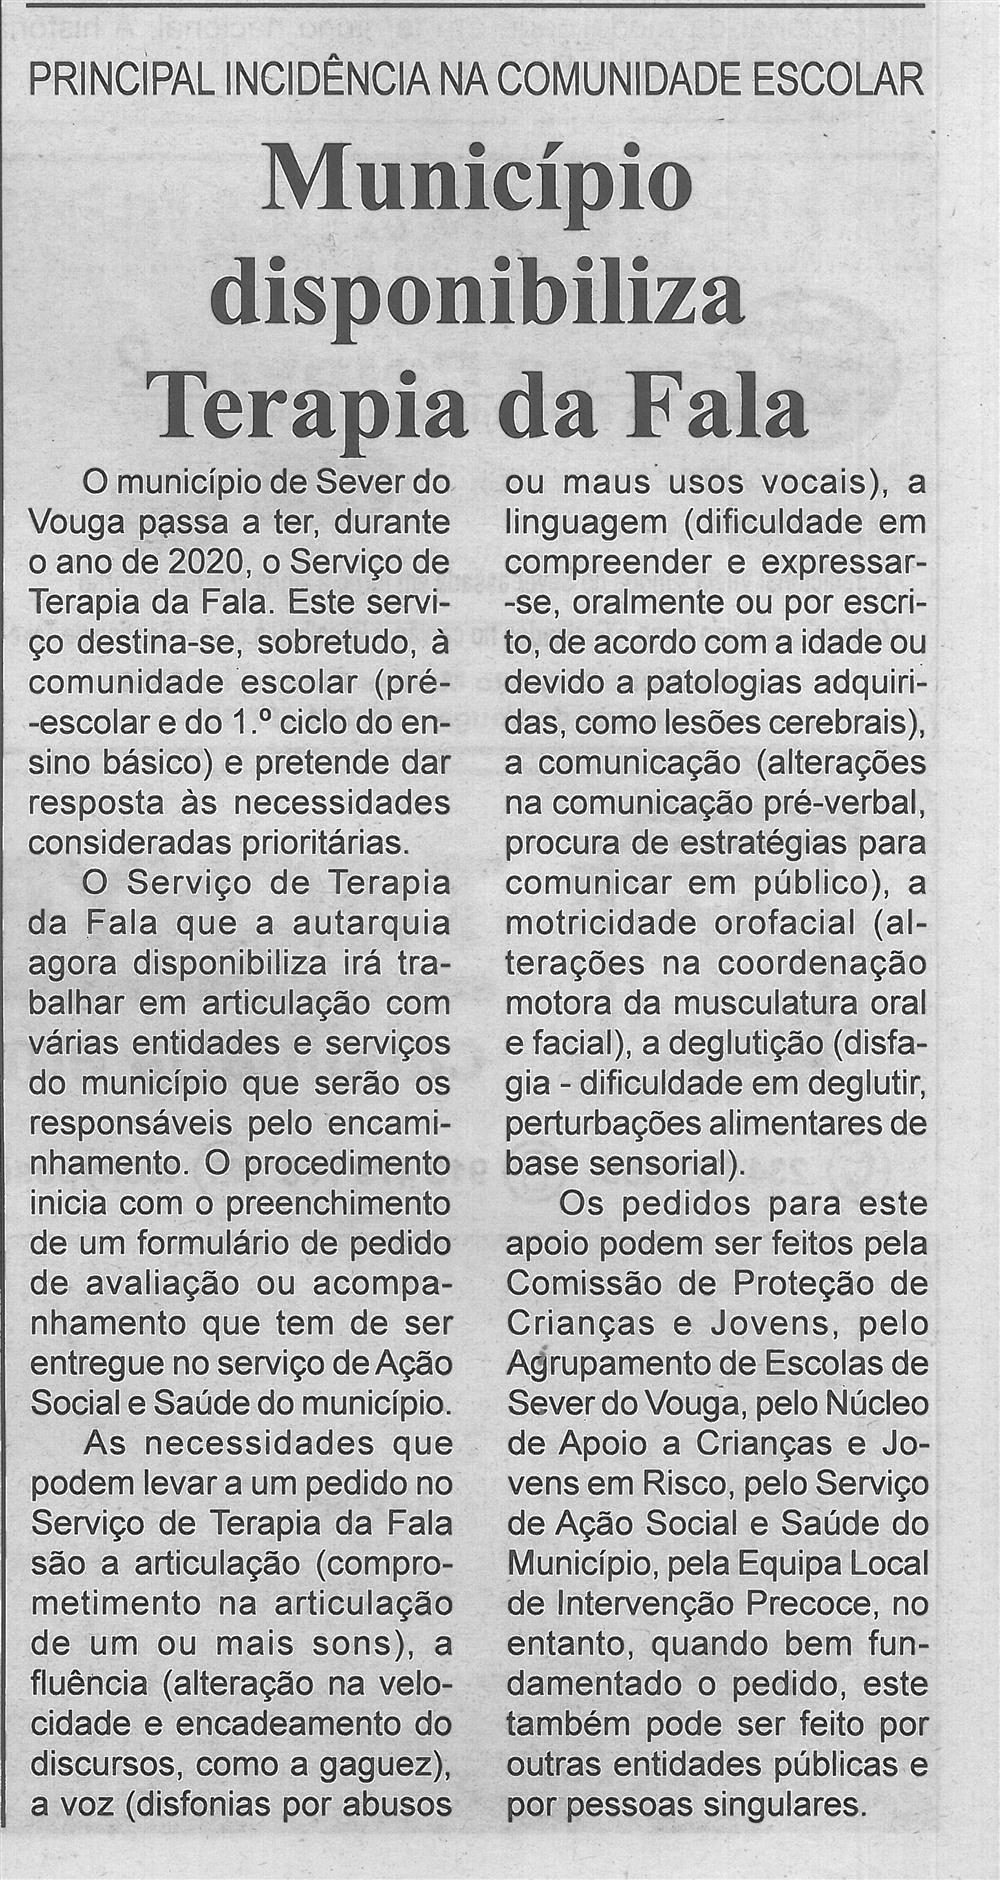 BV-1.ªfev.'20-p.2-Município disponibiliza Terapia da Fala : principal incidência na Comunidade Escolar.jpg